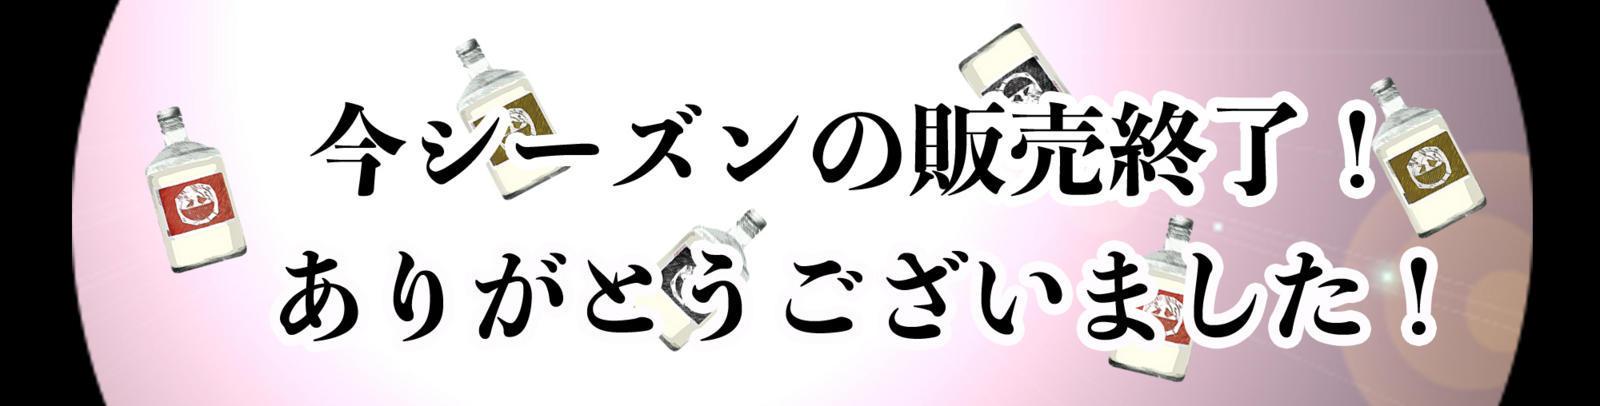 f:id:tottoridekurasu:20180531201027j:plain